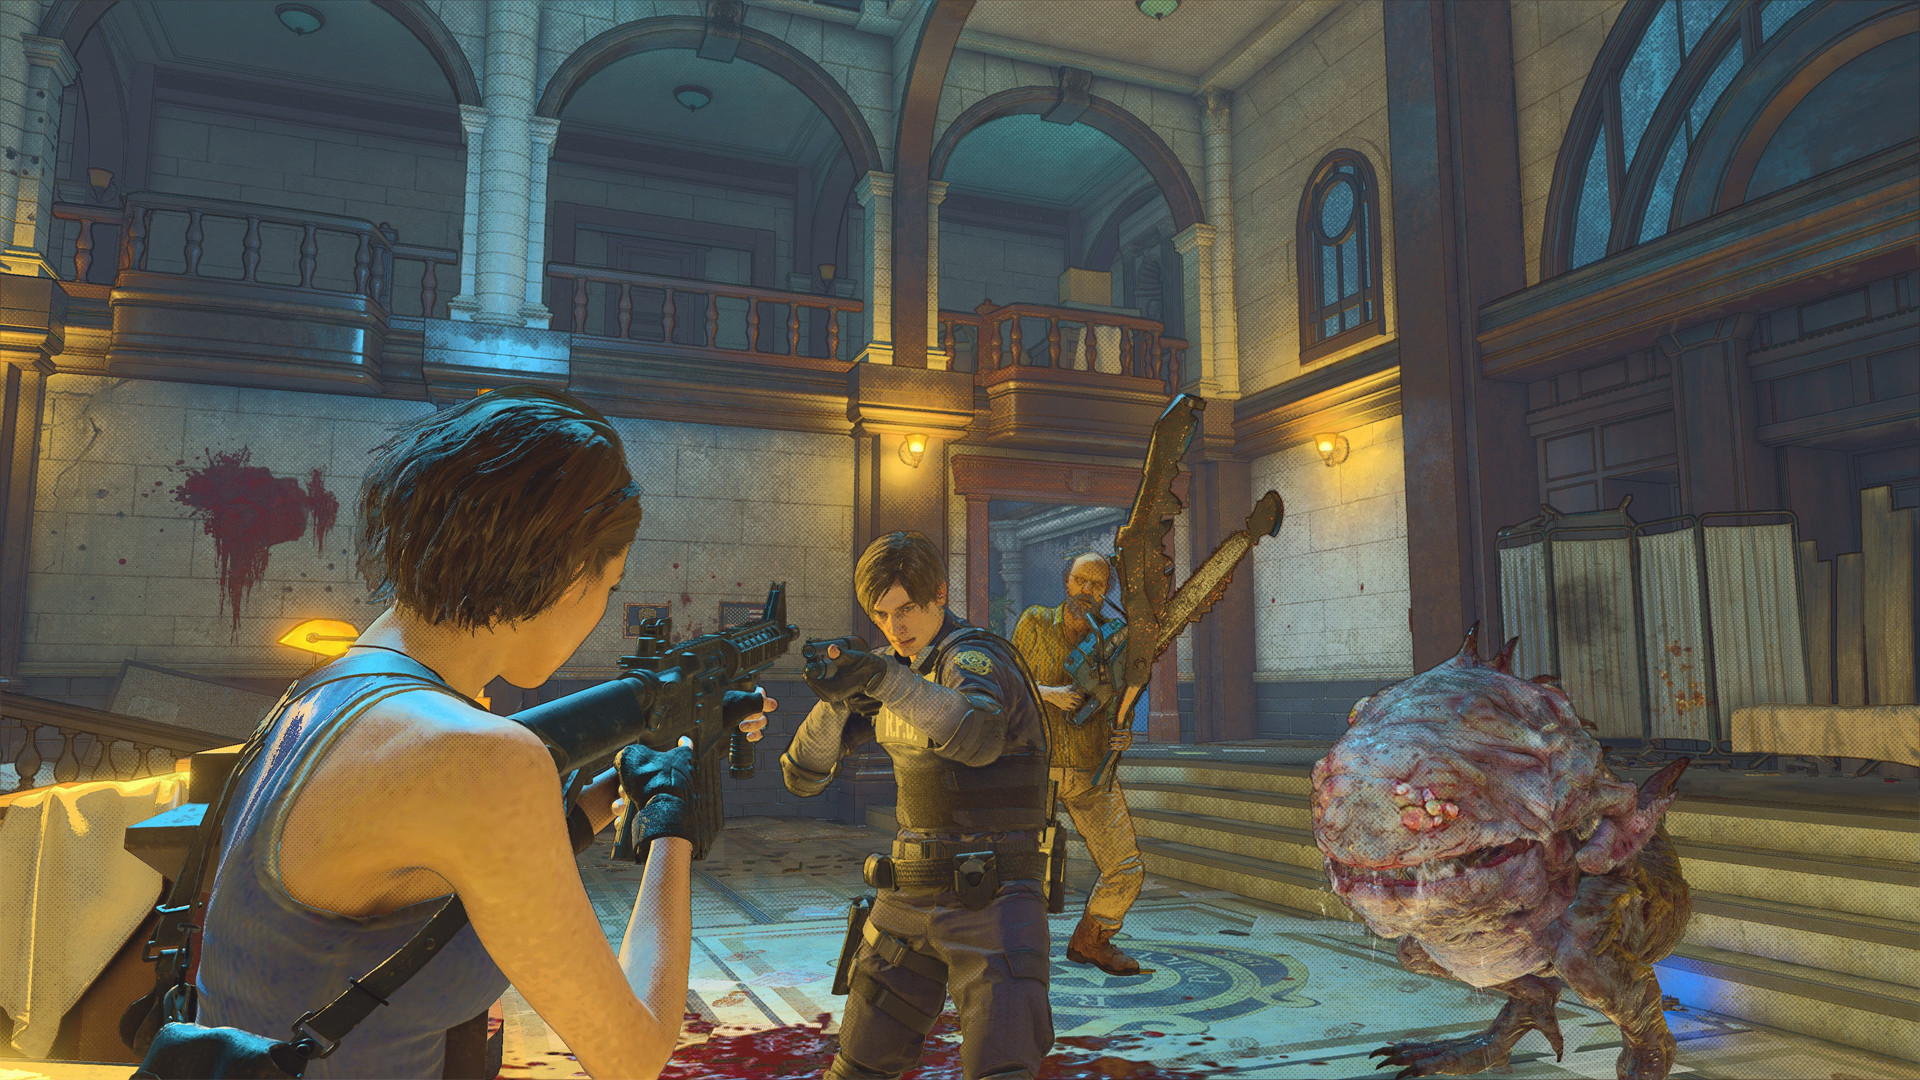 Resident Evil Re Verse open beta